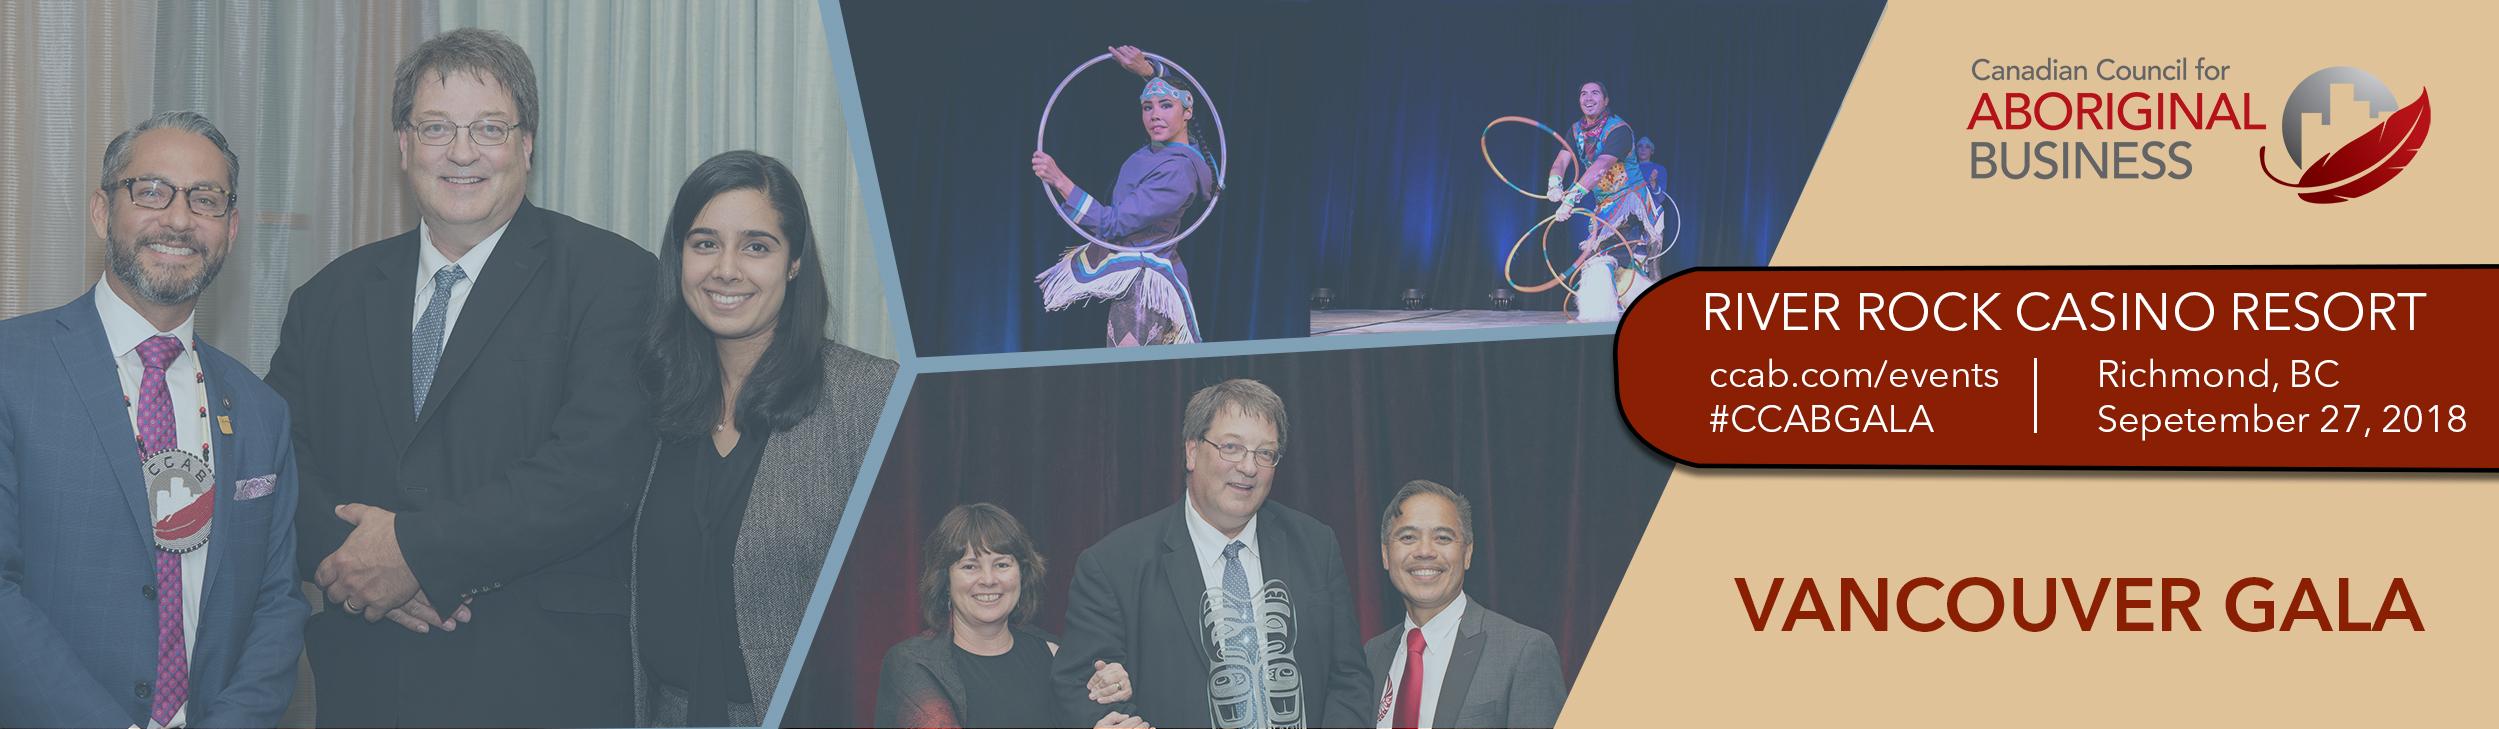 2018 Web Banners - Vancouver Gala